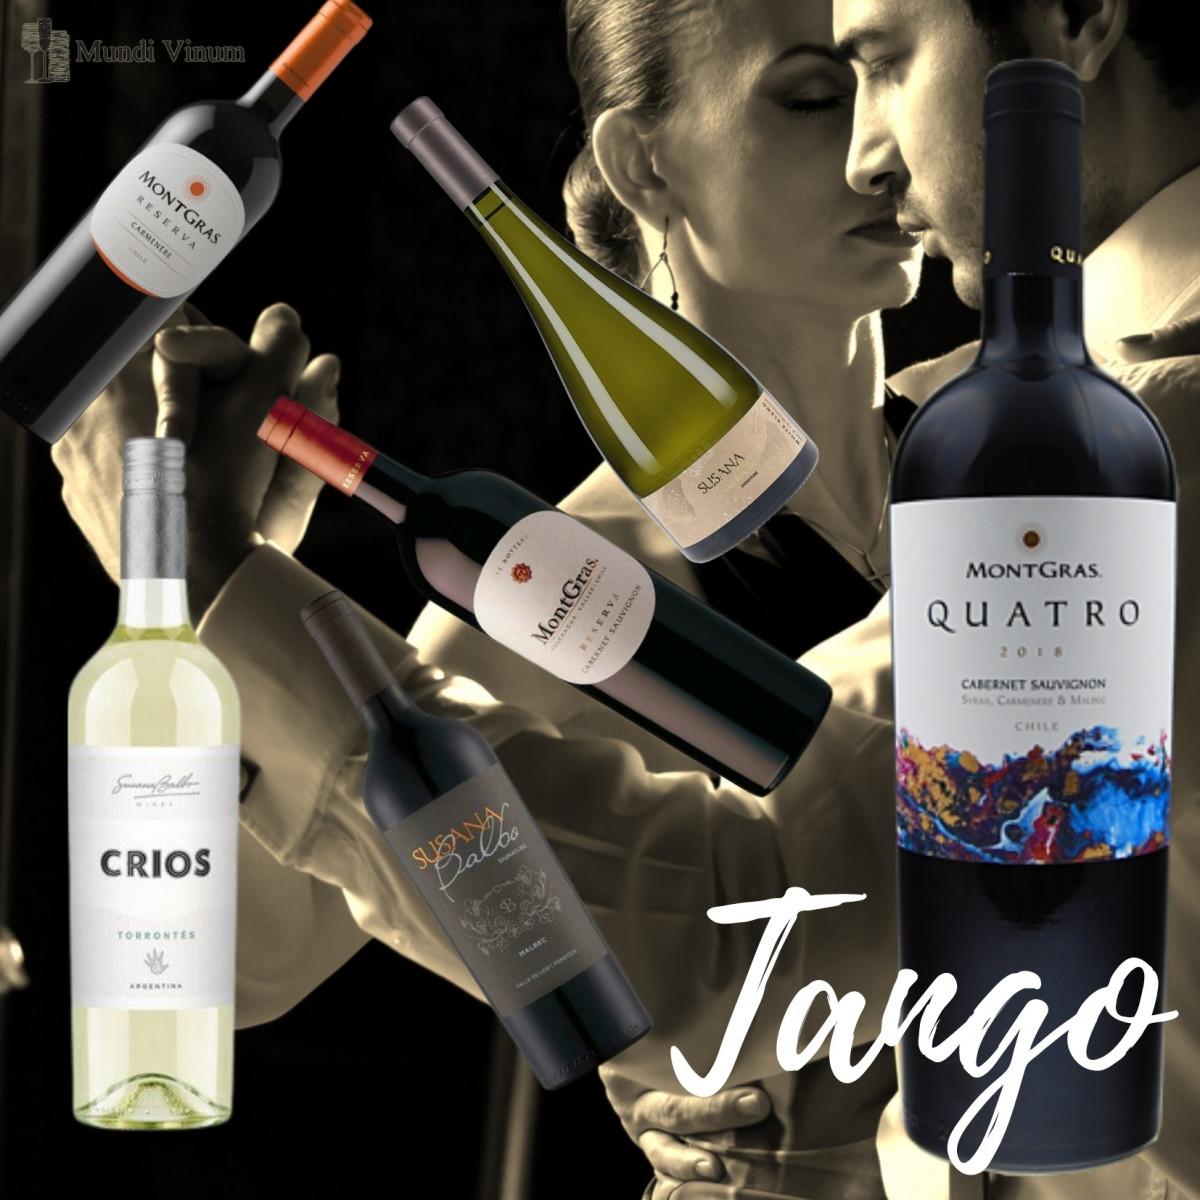 Proefpakket Tango